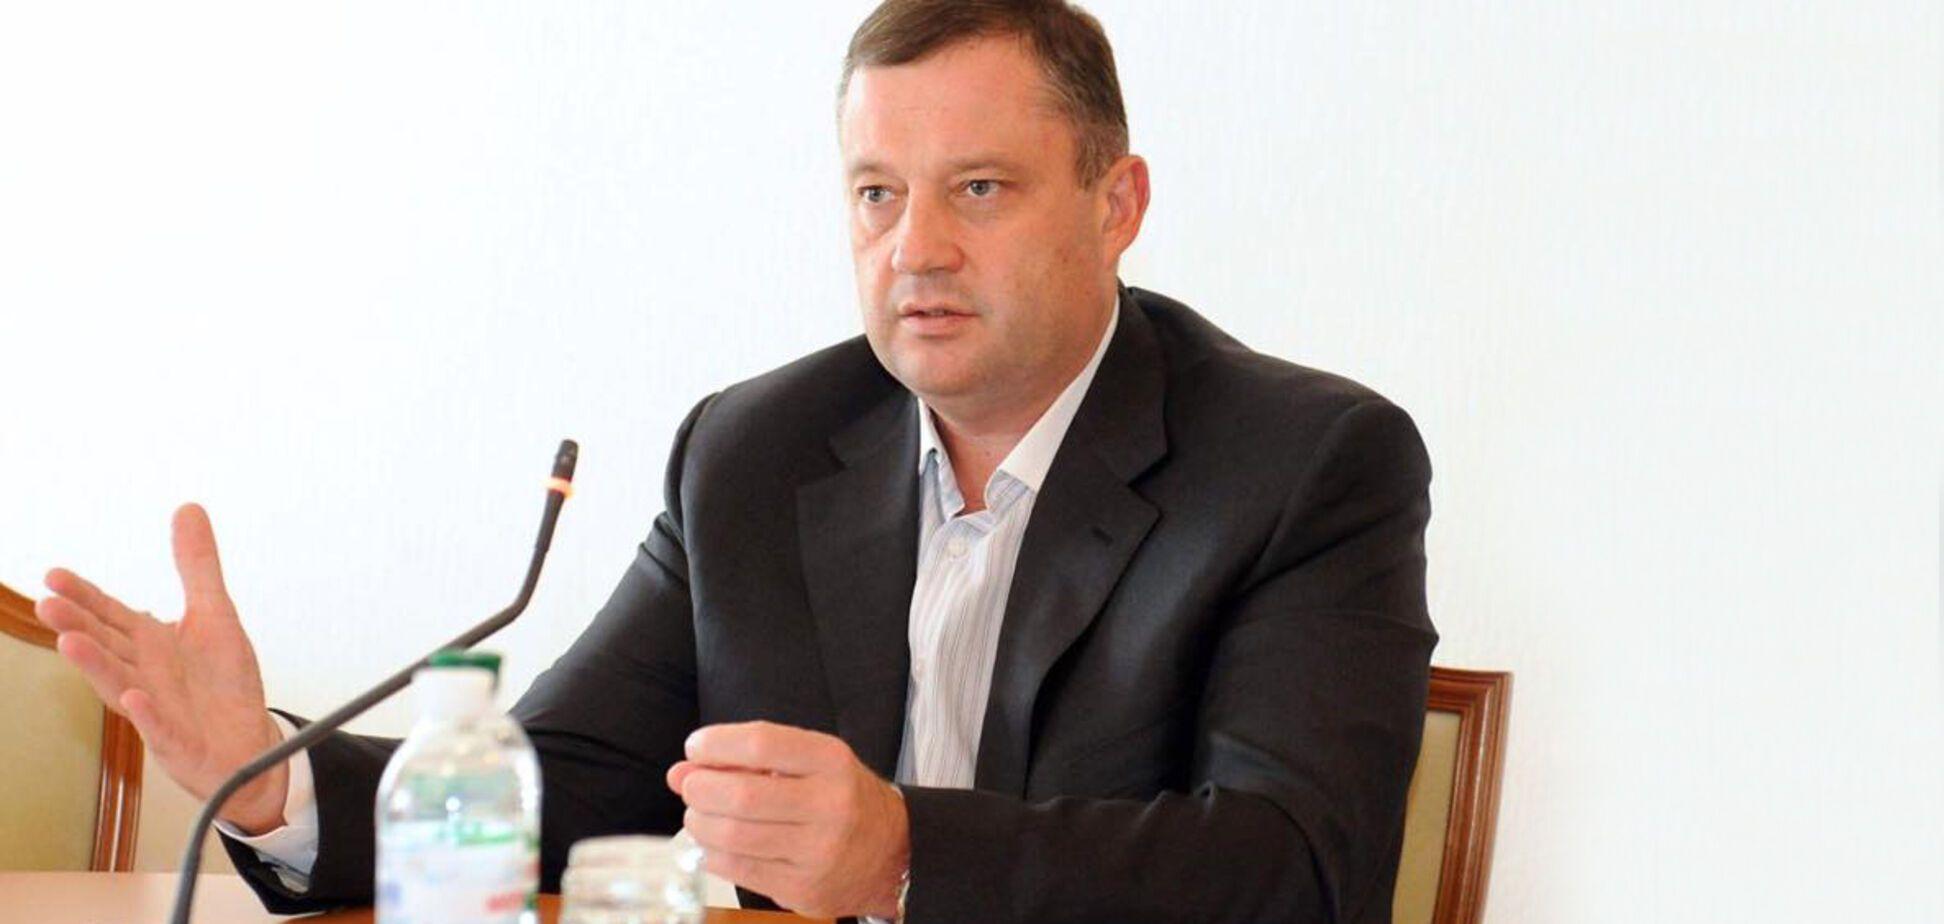 Дубневич рассказал, что мешает эффективной работе 'Укрзалізниці'